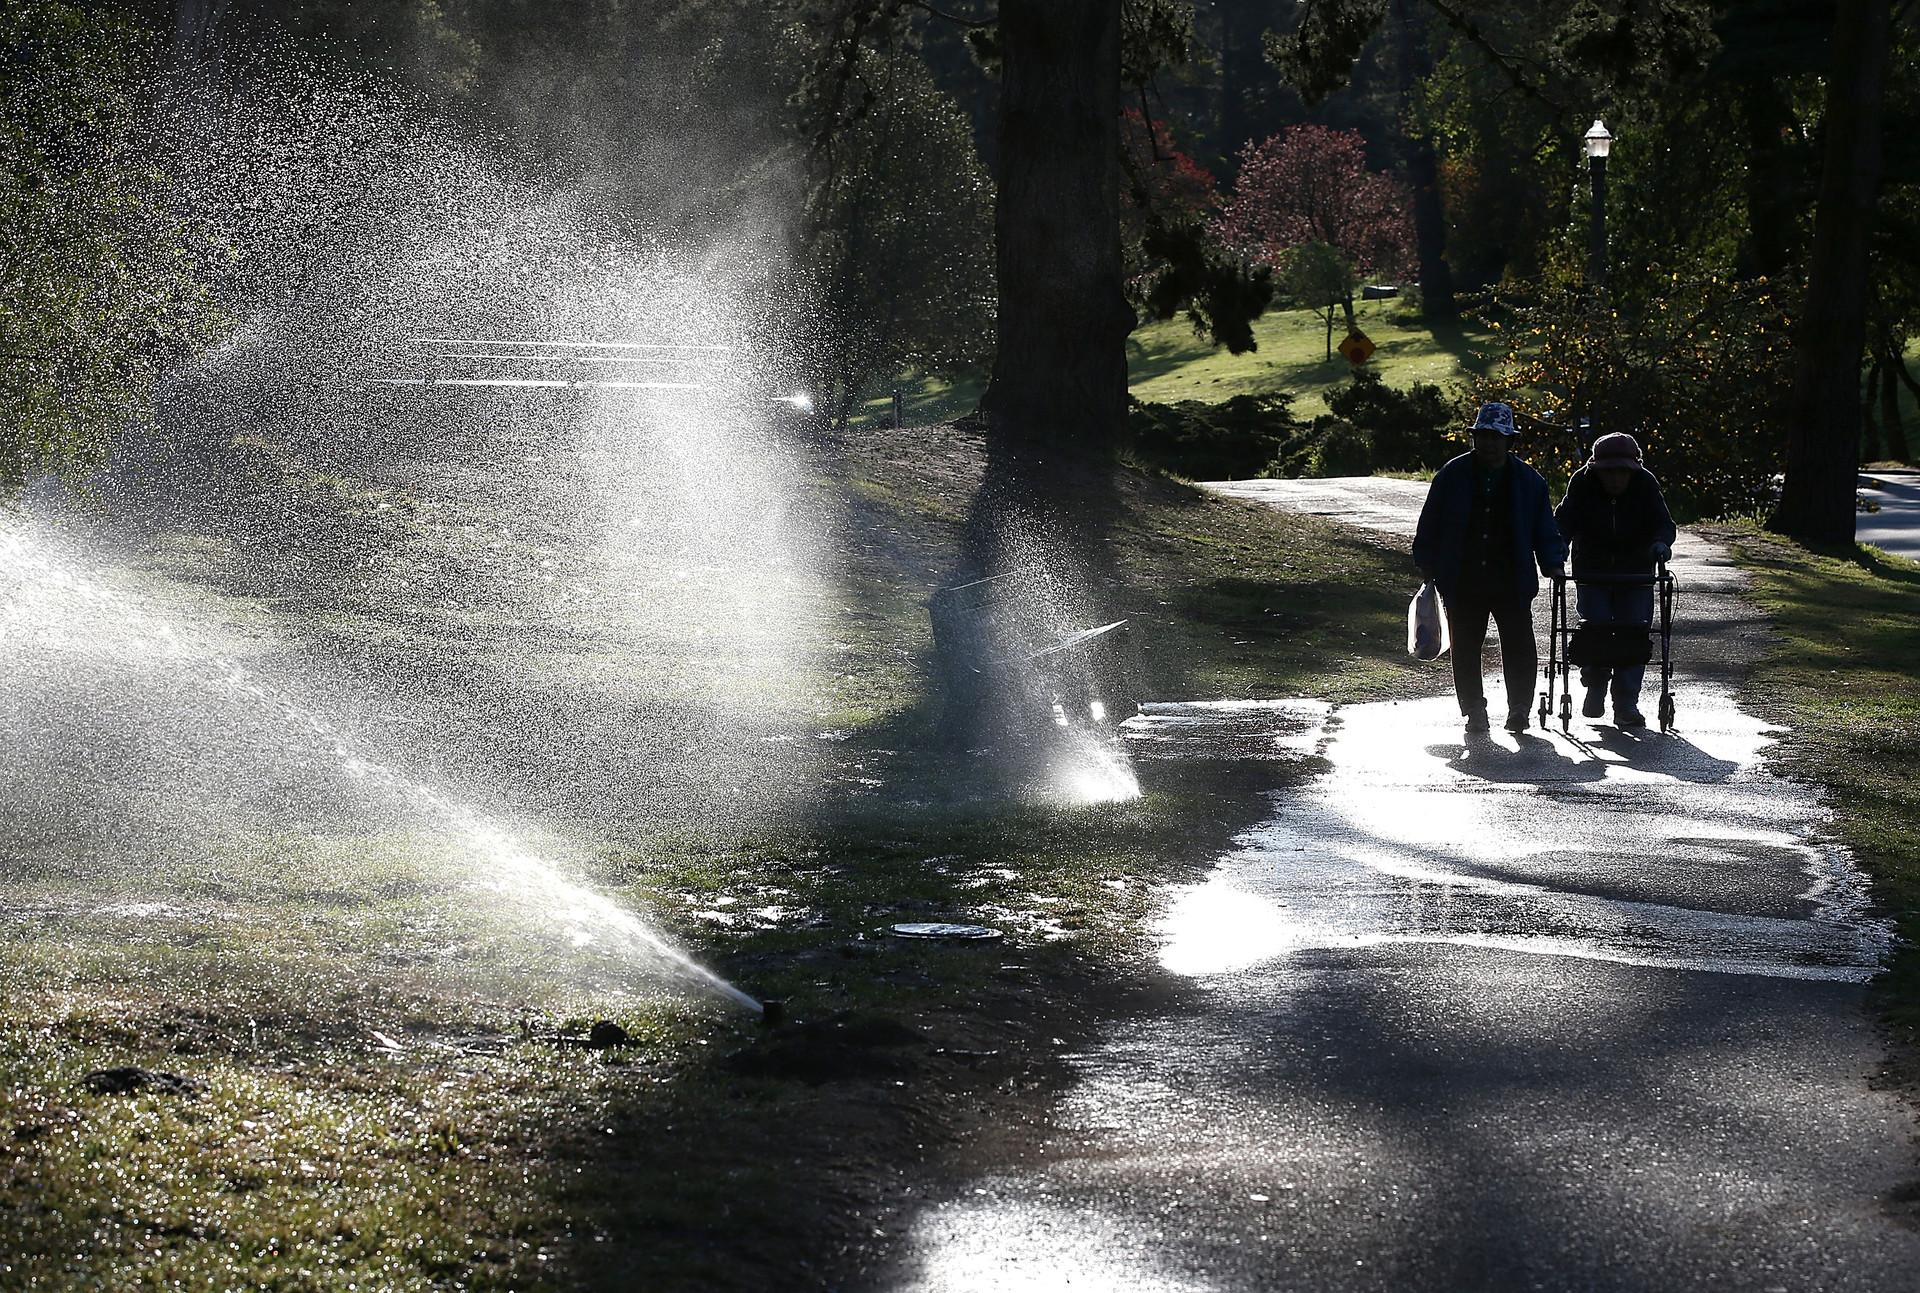 Lawn sprinklers in San Francisco's Golden Gate Park, in April. (Justin Sullivan/Getty Images)